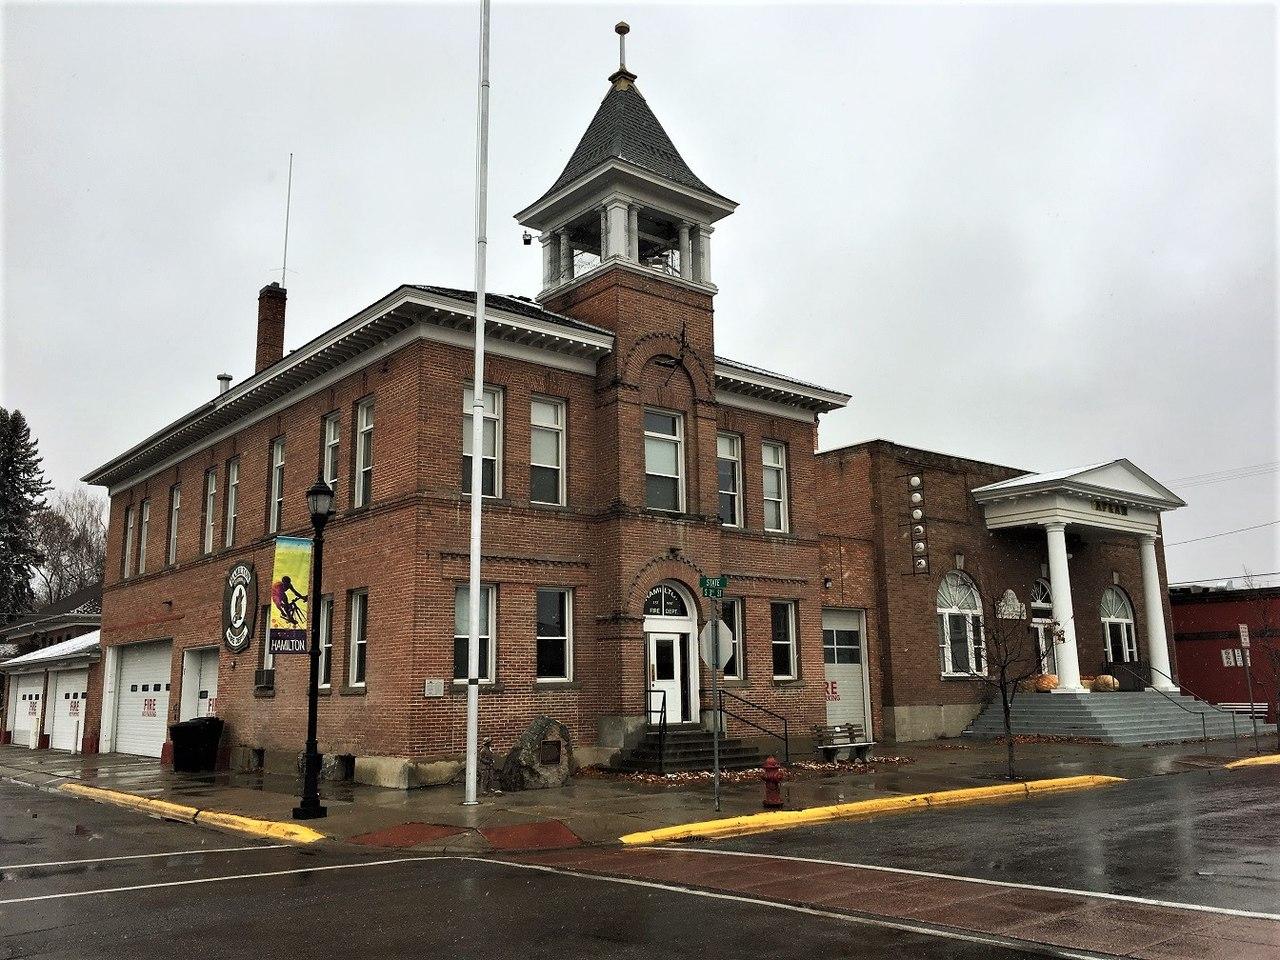 Hamilton City Hall was built in 1907.